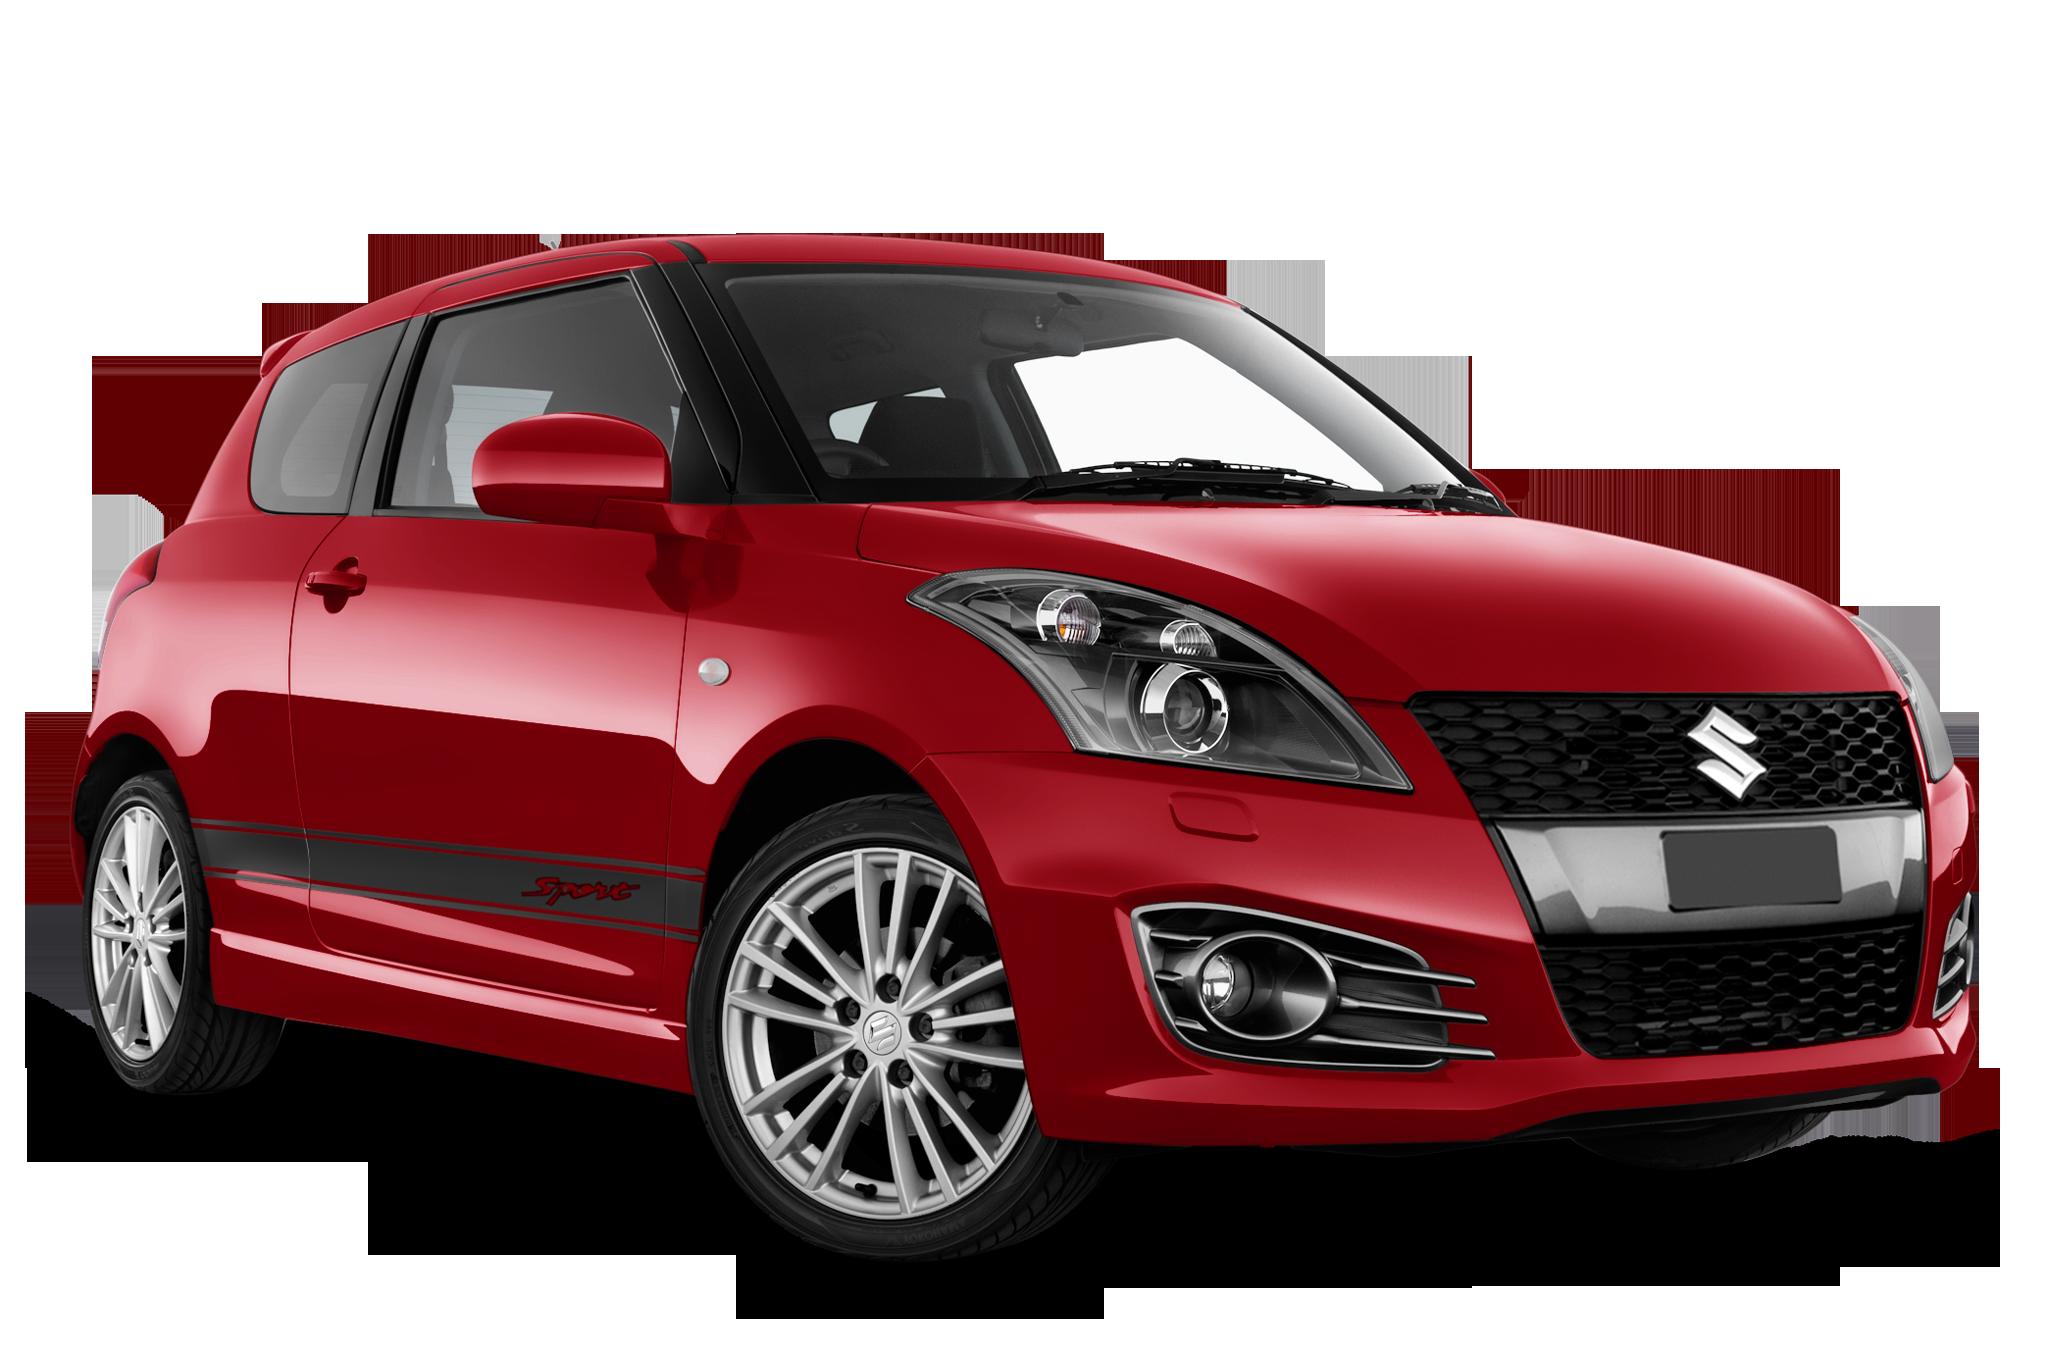 Suzuki Swift company car front view